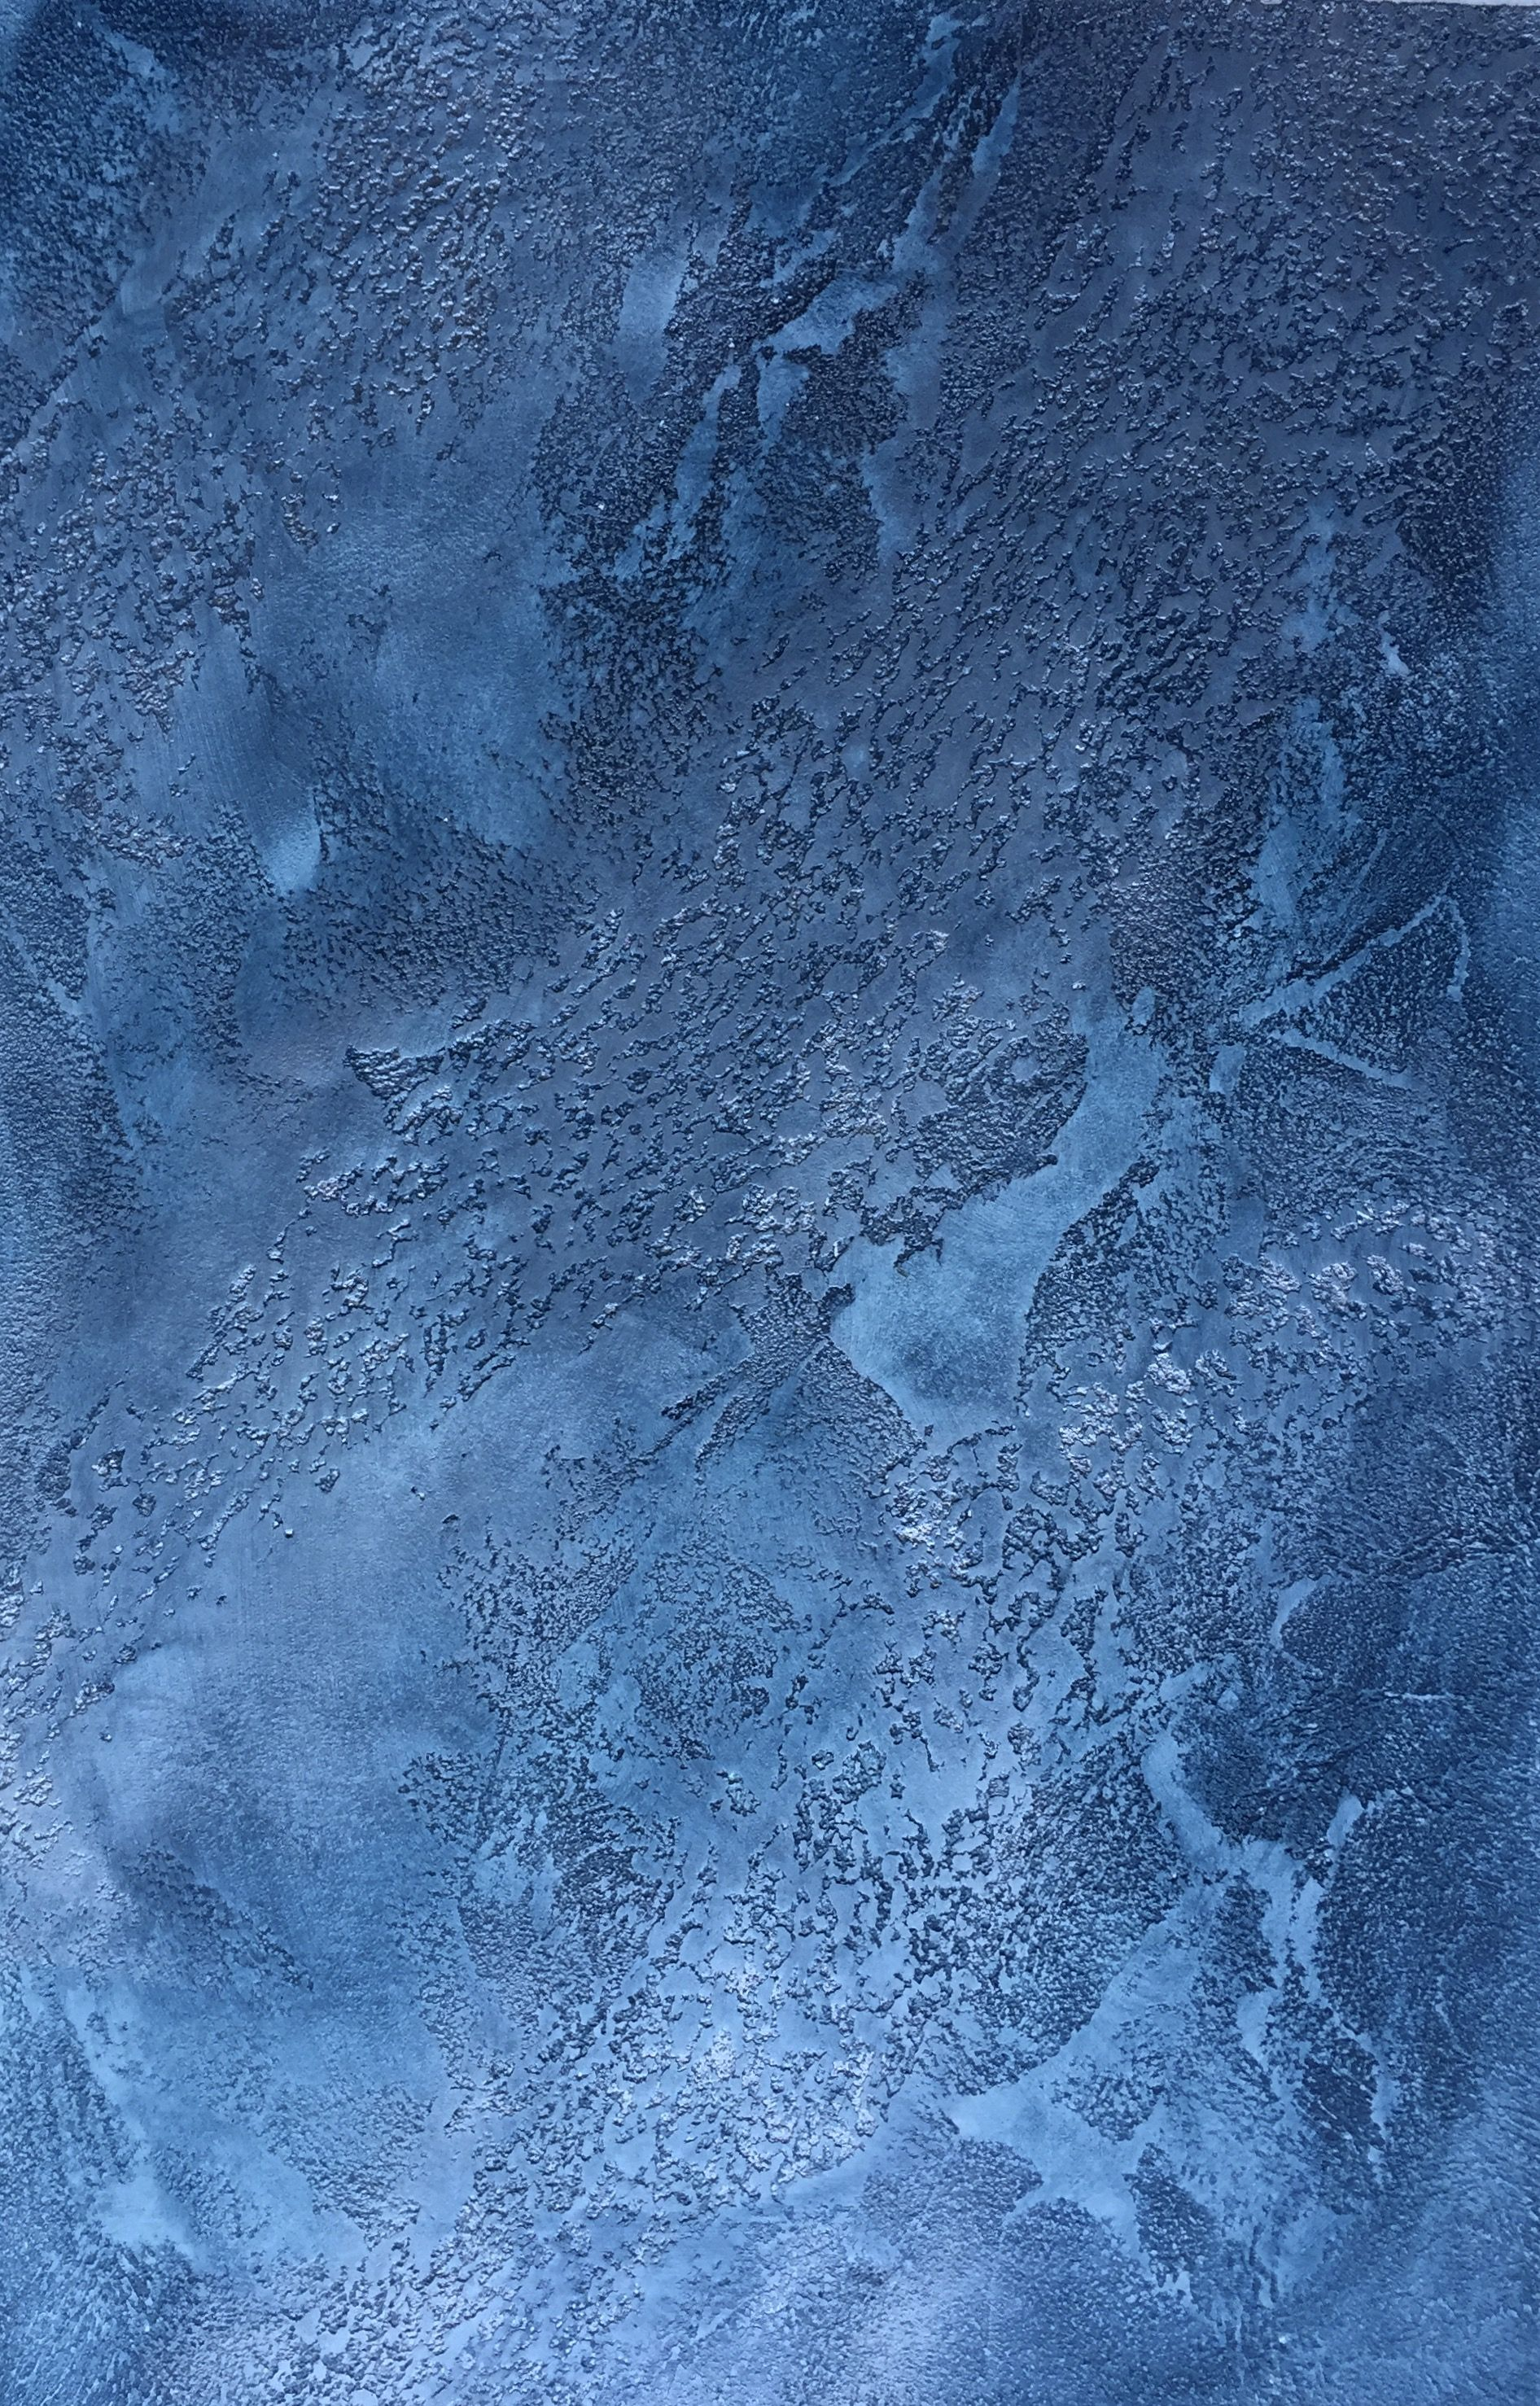 6ca4fa44089a4852ee5eac9f362b815e.jpg (1892×2956) | textures ...